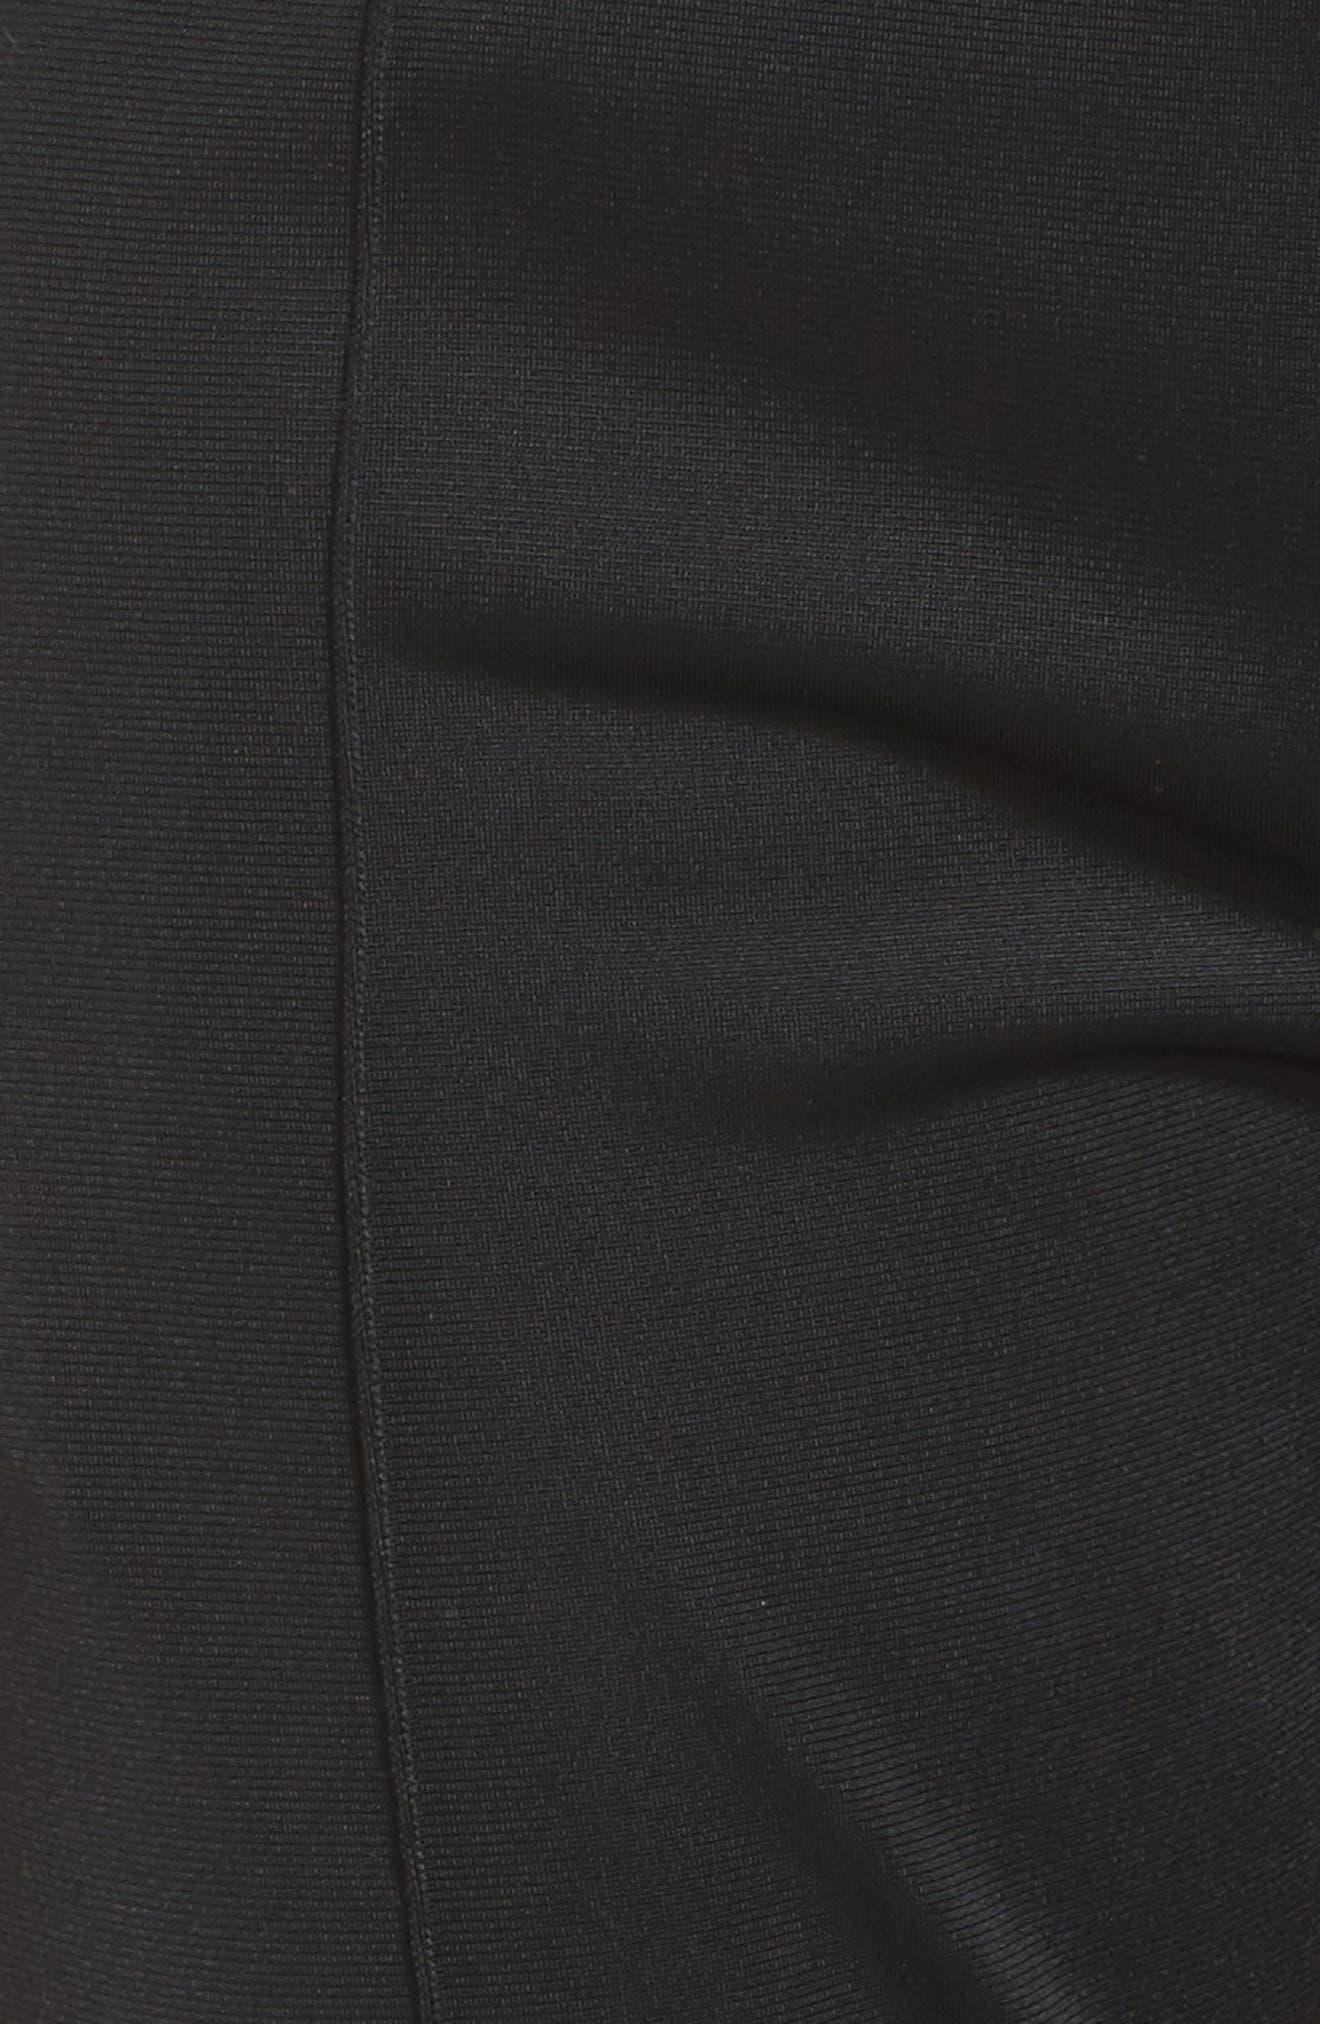 Originals Superstar Track Pants,                             Alternate thumbnail 6, color,                             Black